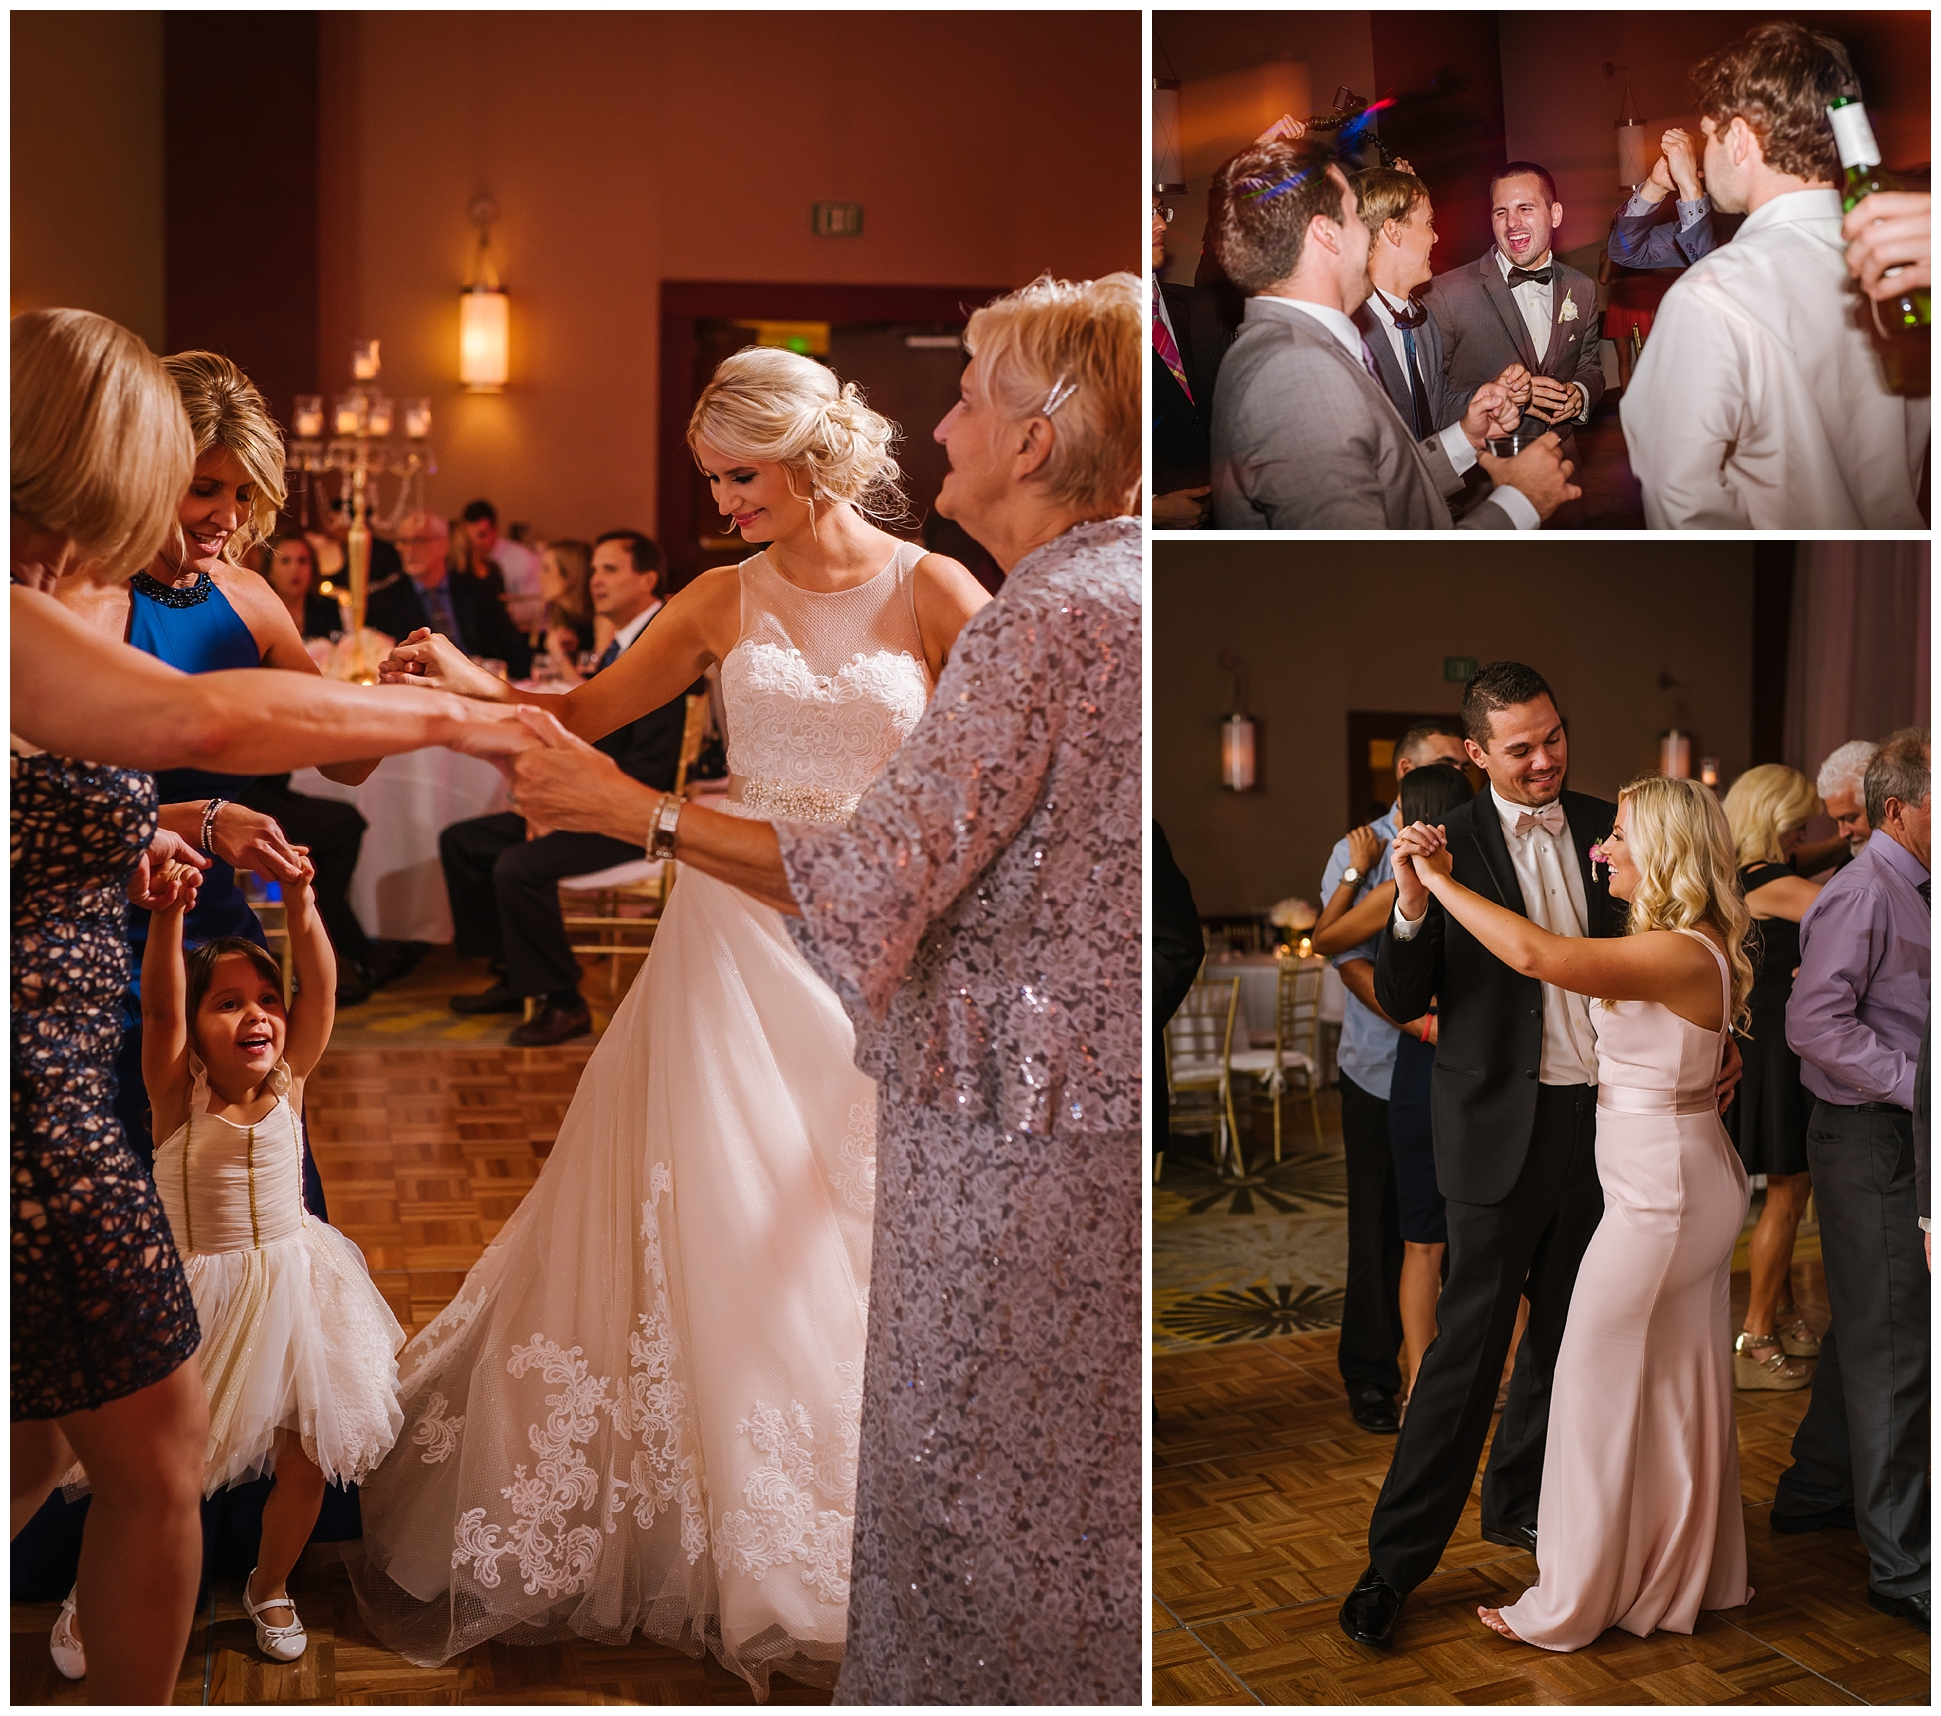 Sarasota-wedding-photographer-hyatt-regency-blush_0066.jpg